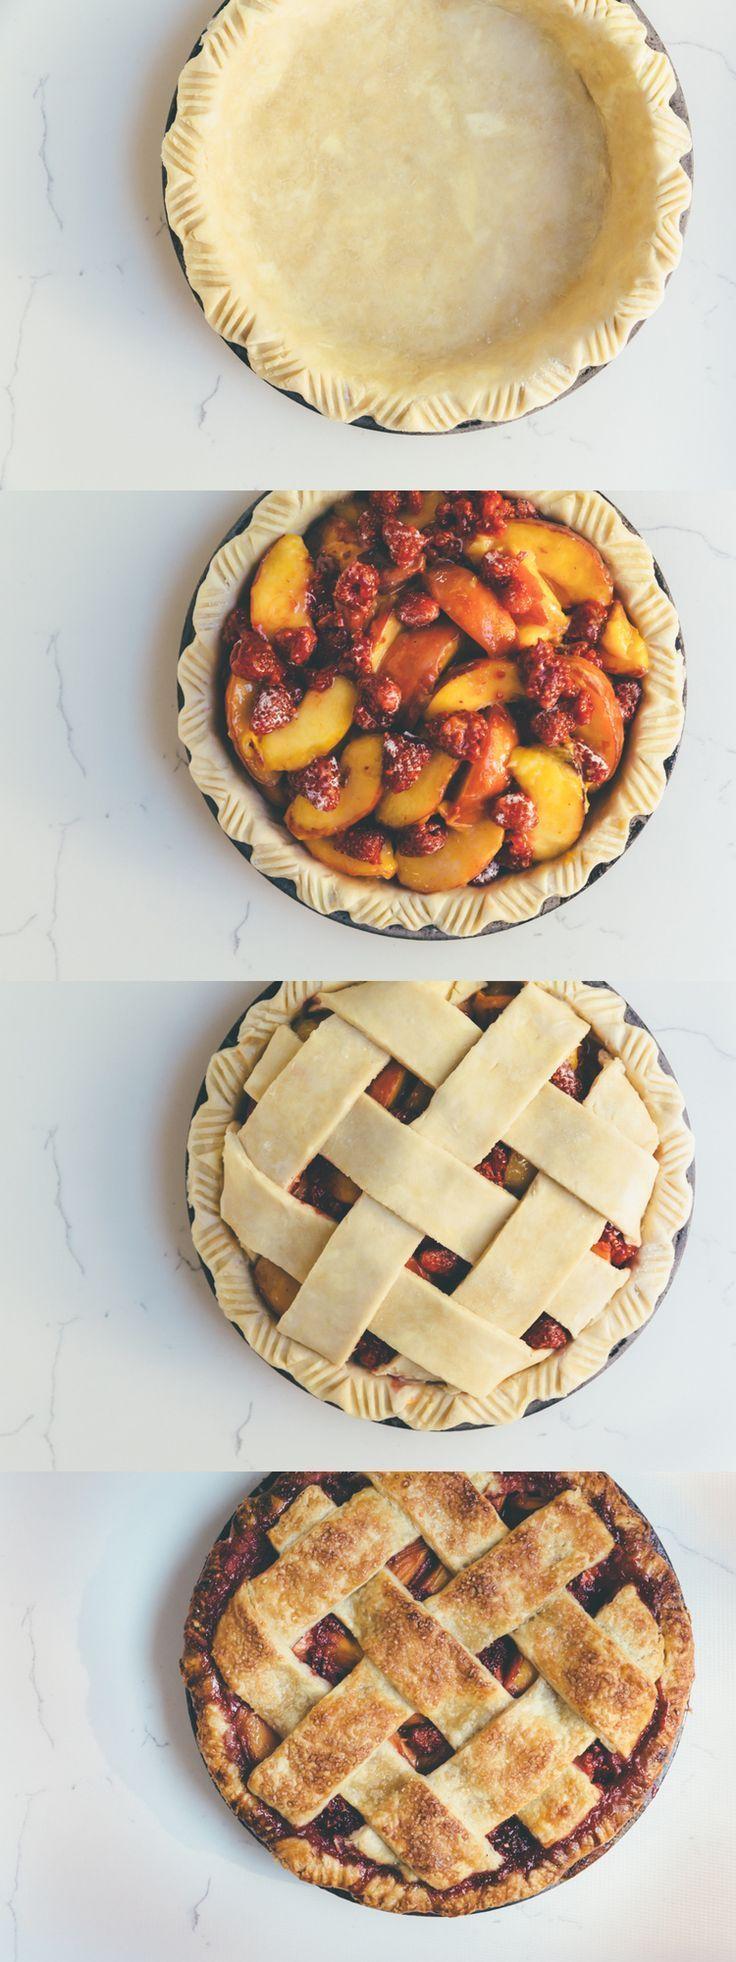 Peach Raspberry Pie by millyskitchen: A delicious sweet and tart peach-raspberry…